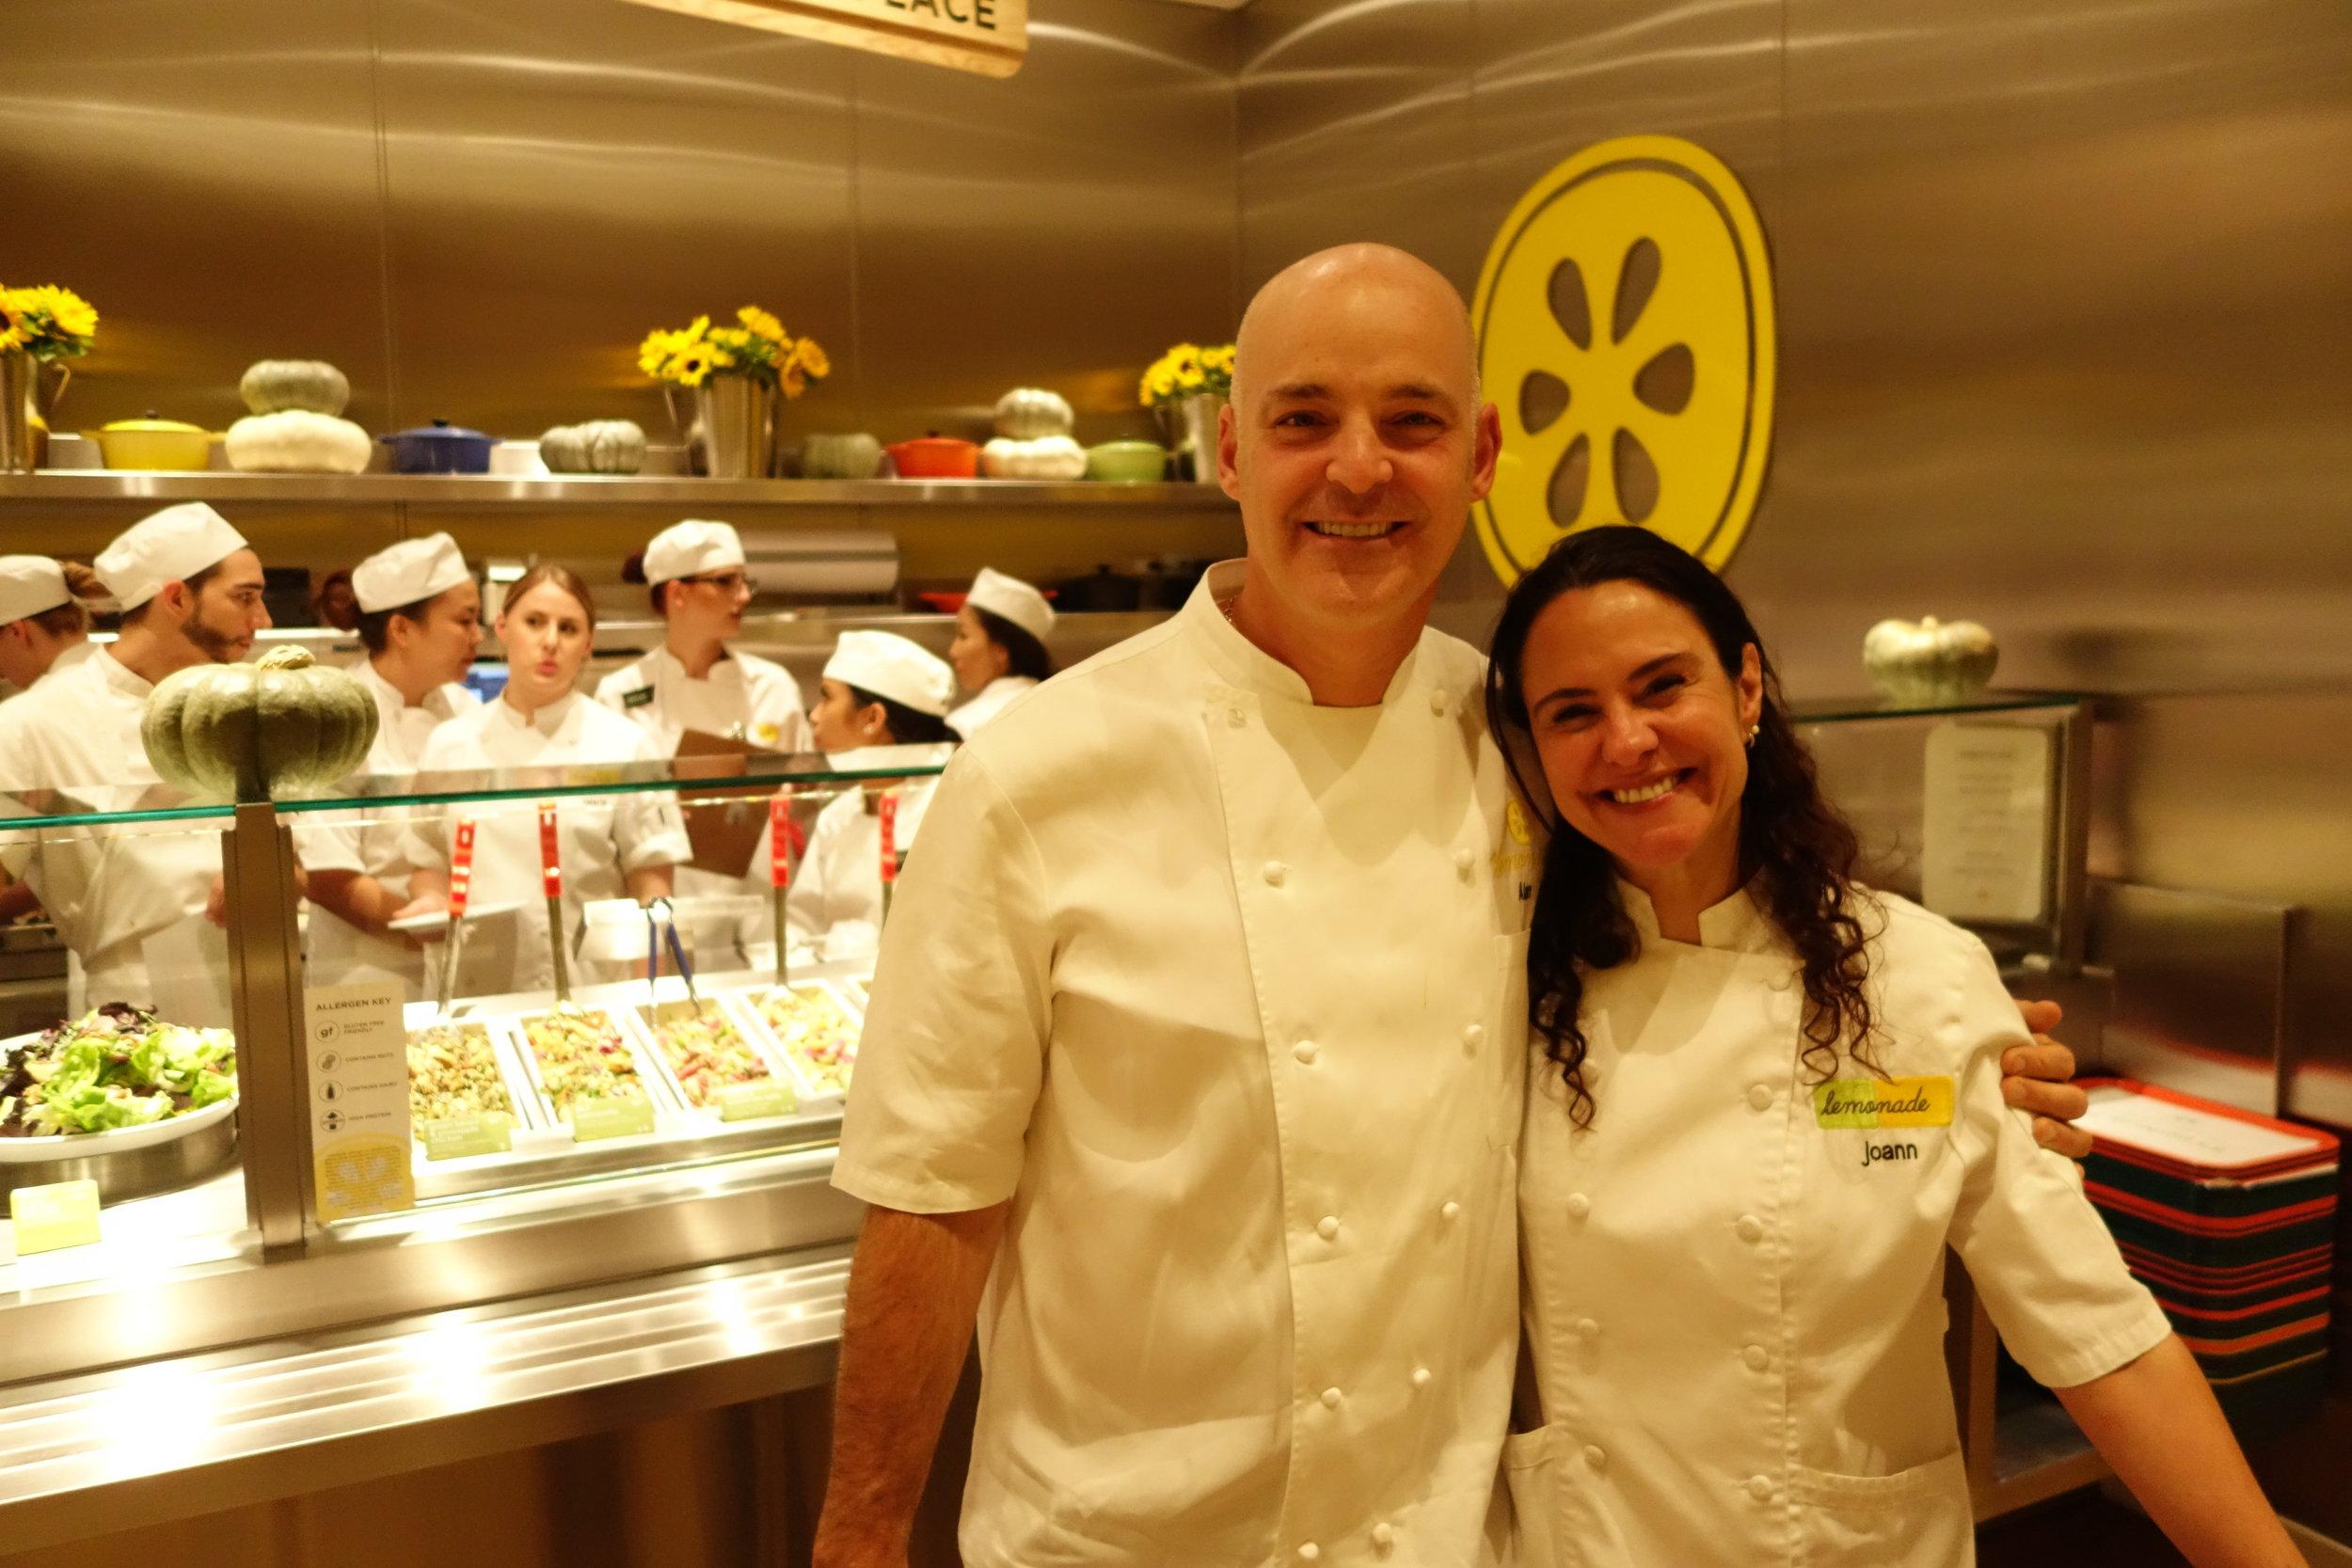 Lemonade Founder & Executive Chef Alan Jackson (left), & Head of Marketing JoAnn Cianciulli (right)